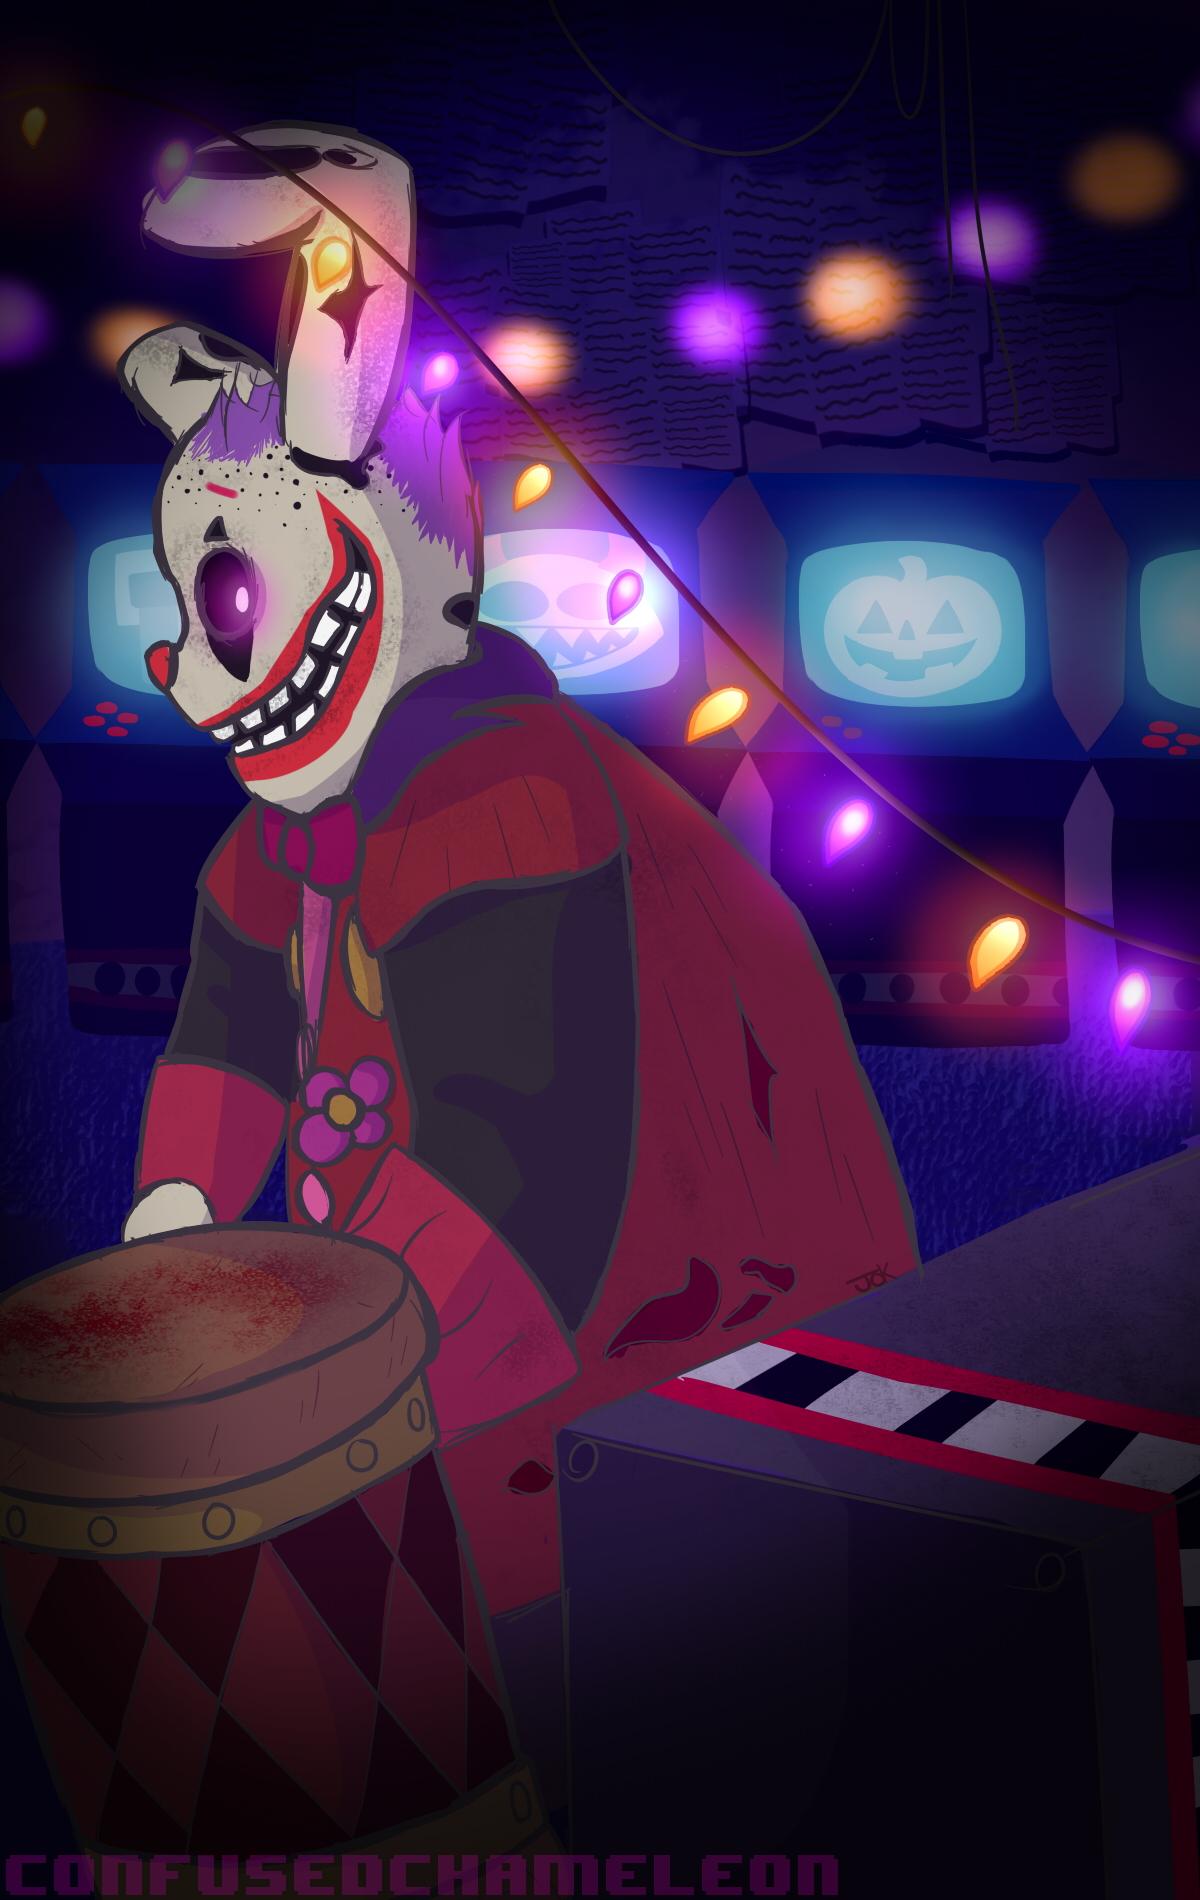 WHERE ARE YOU?! - Clown Springtrap FNAF